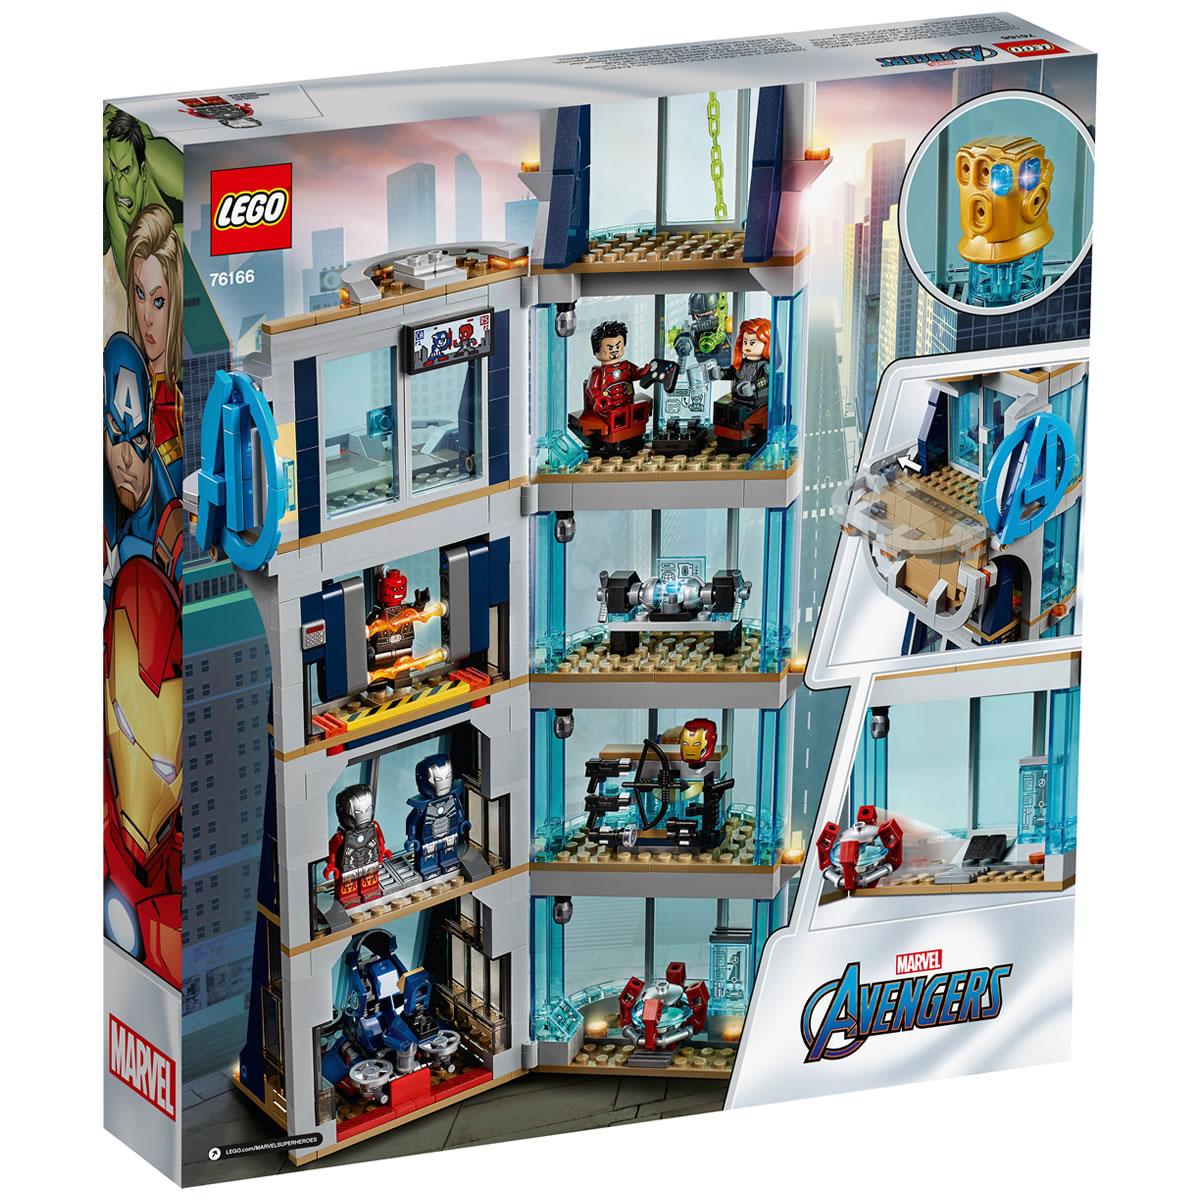 76166-lego-marvel-avengers-tower-turm-box-back zusammengebaut.com